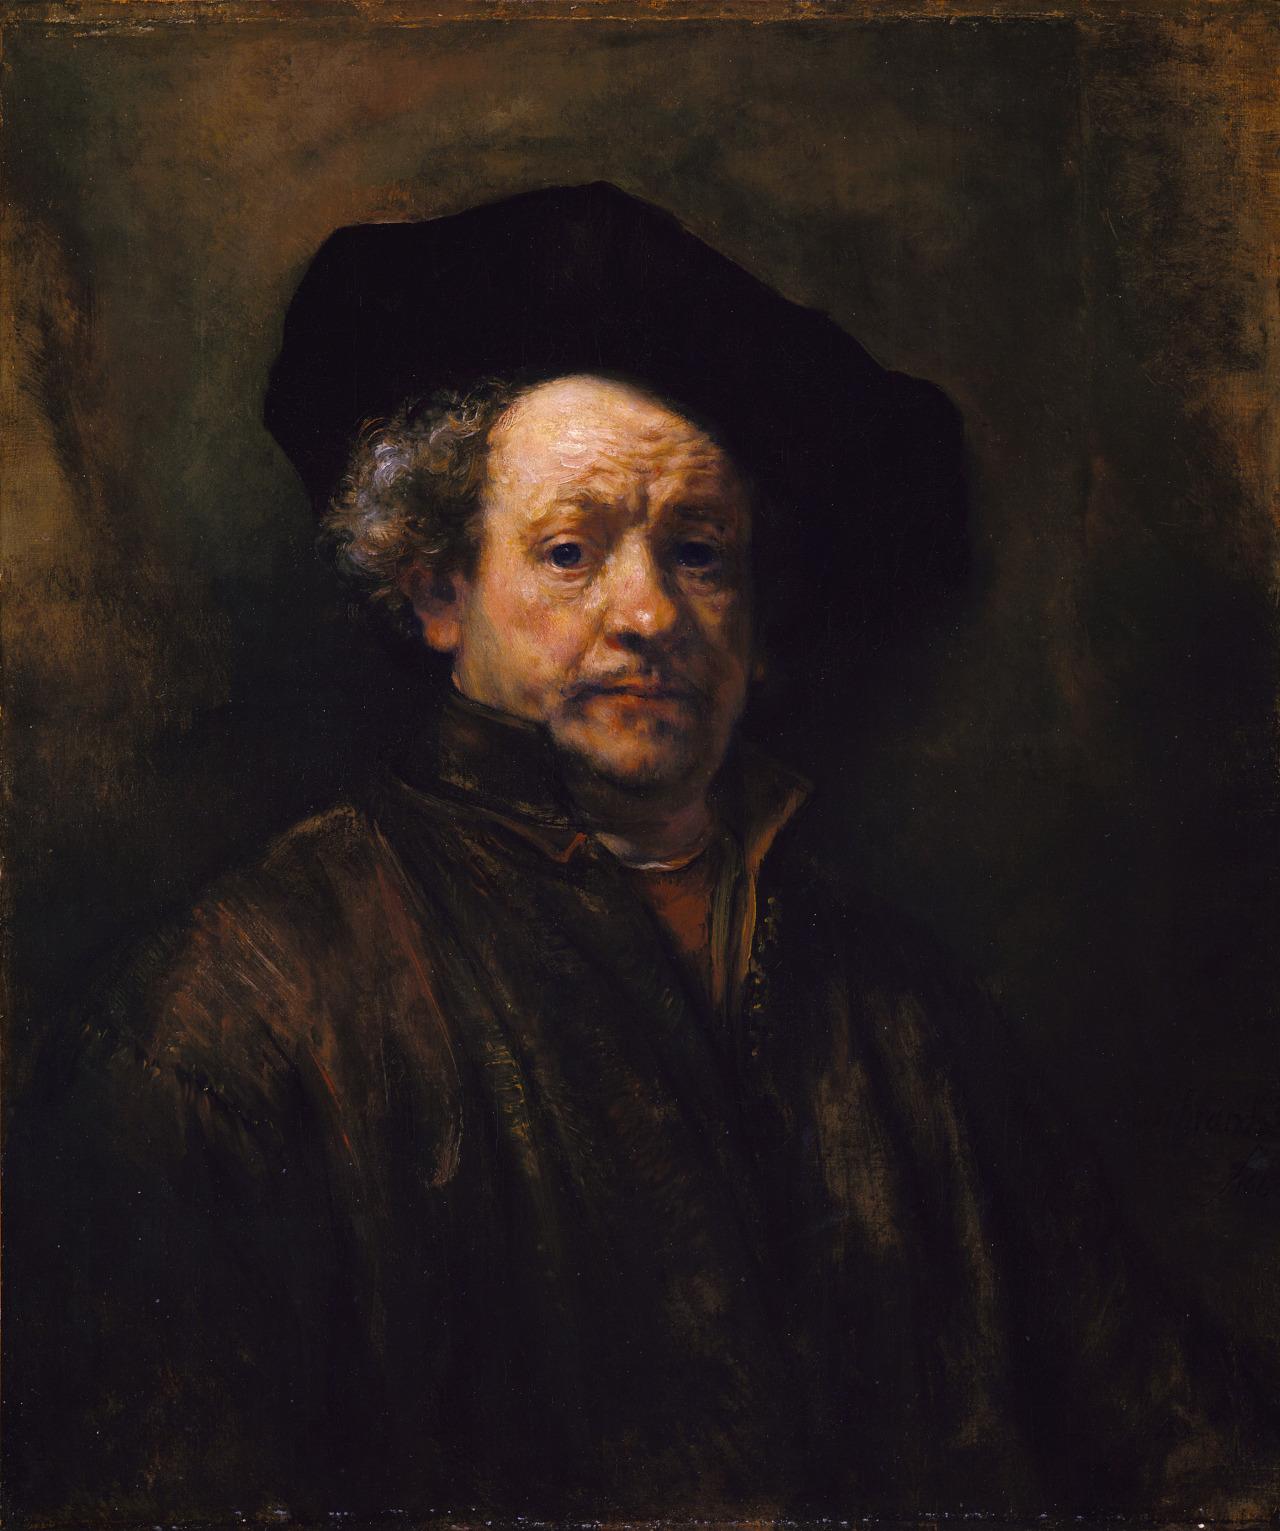 Рембрандт ван Рейн – Автопортрет, 1660